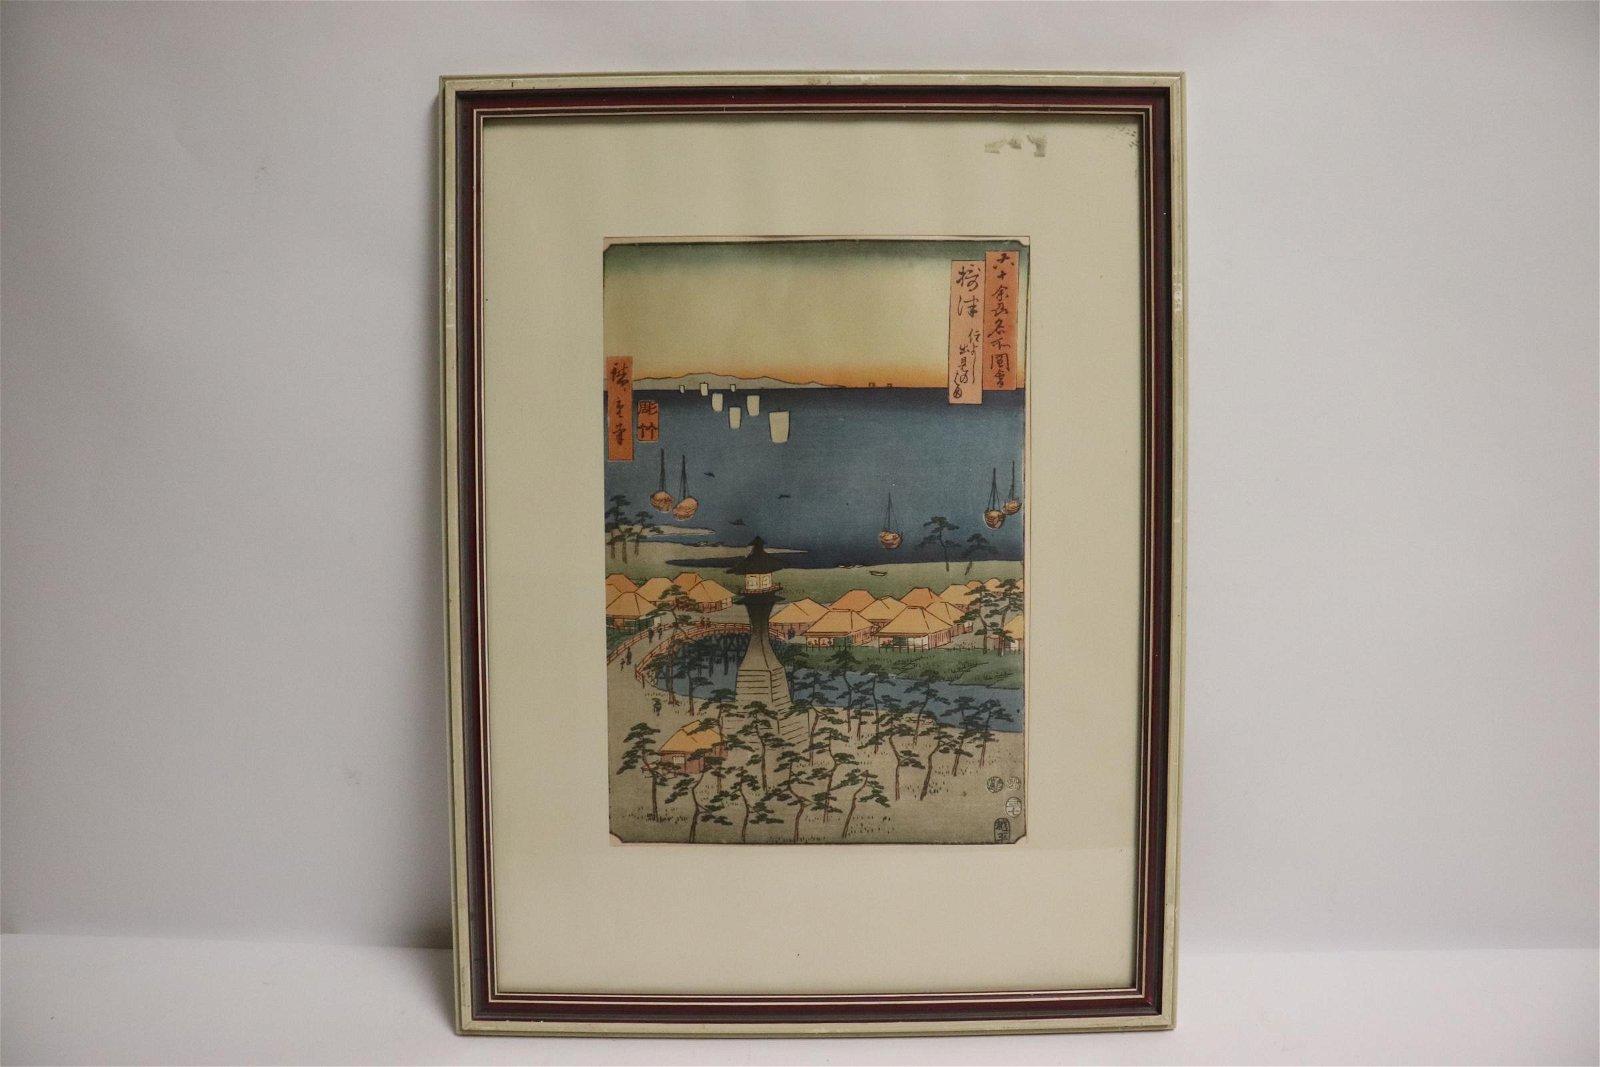 Framed vintage Japanese w/b print by Hiroshige